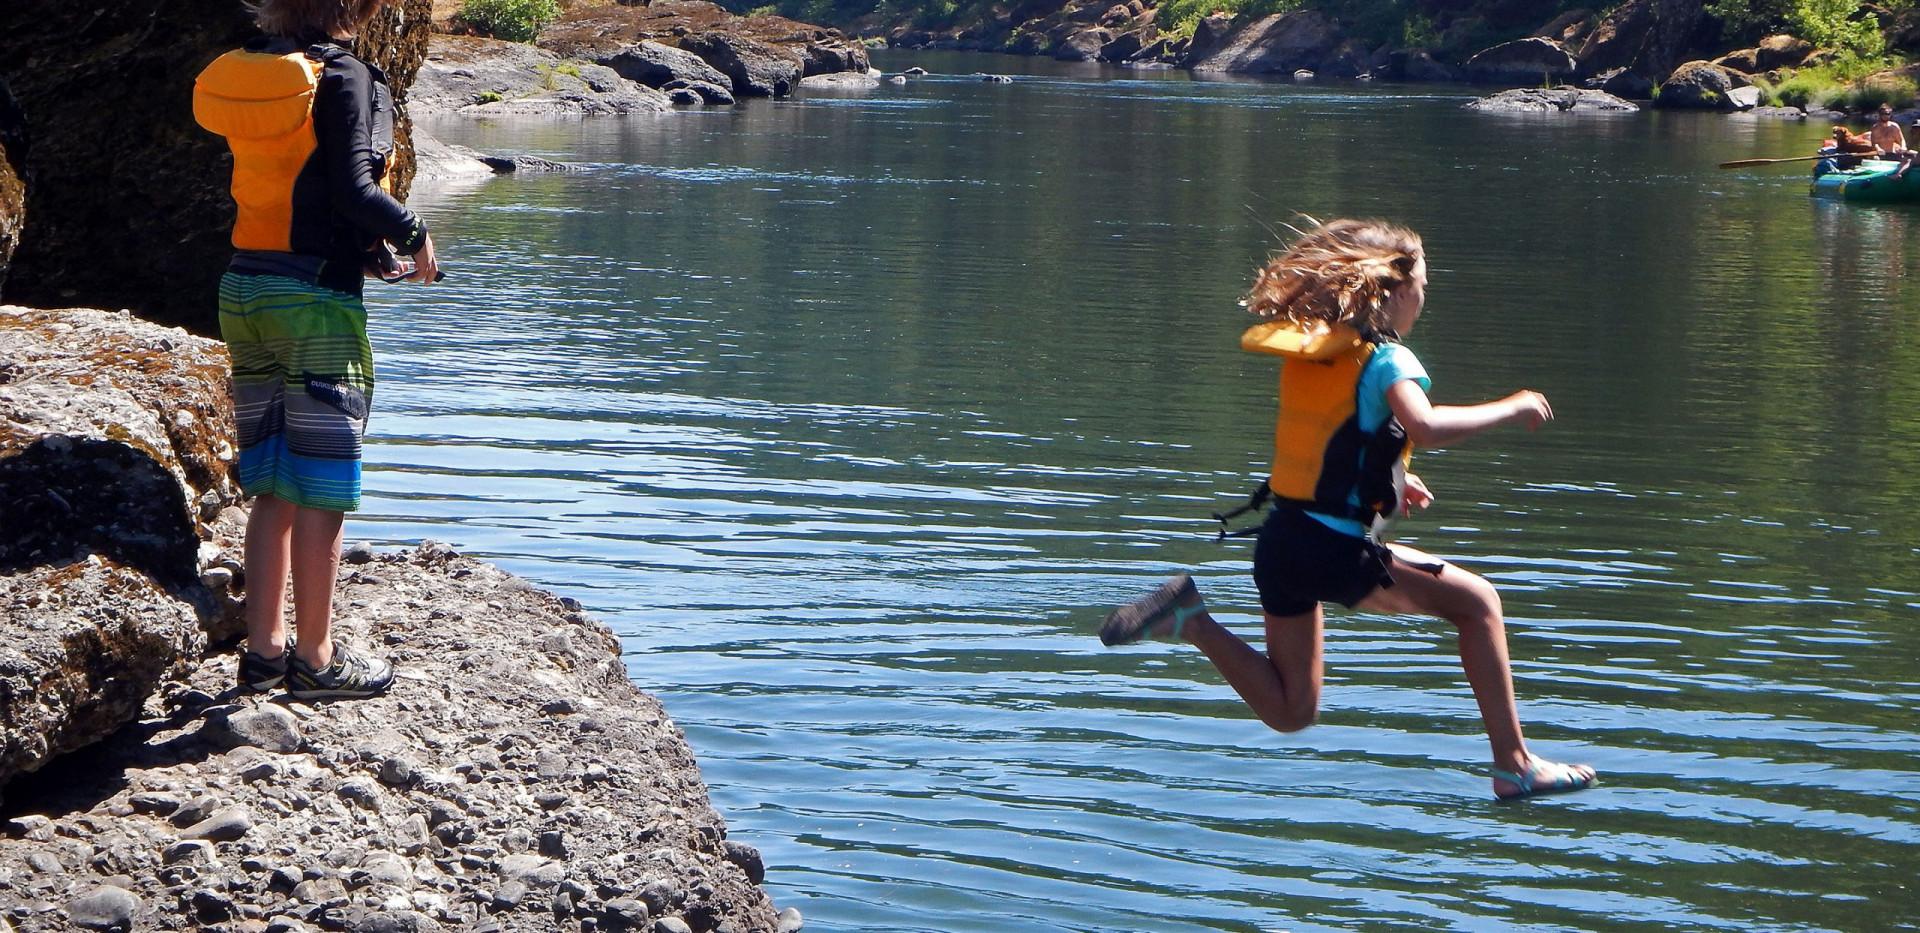 Rogue River Rafting - Oregon Rafting - Rock Jumping - kids